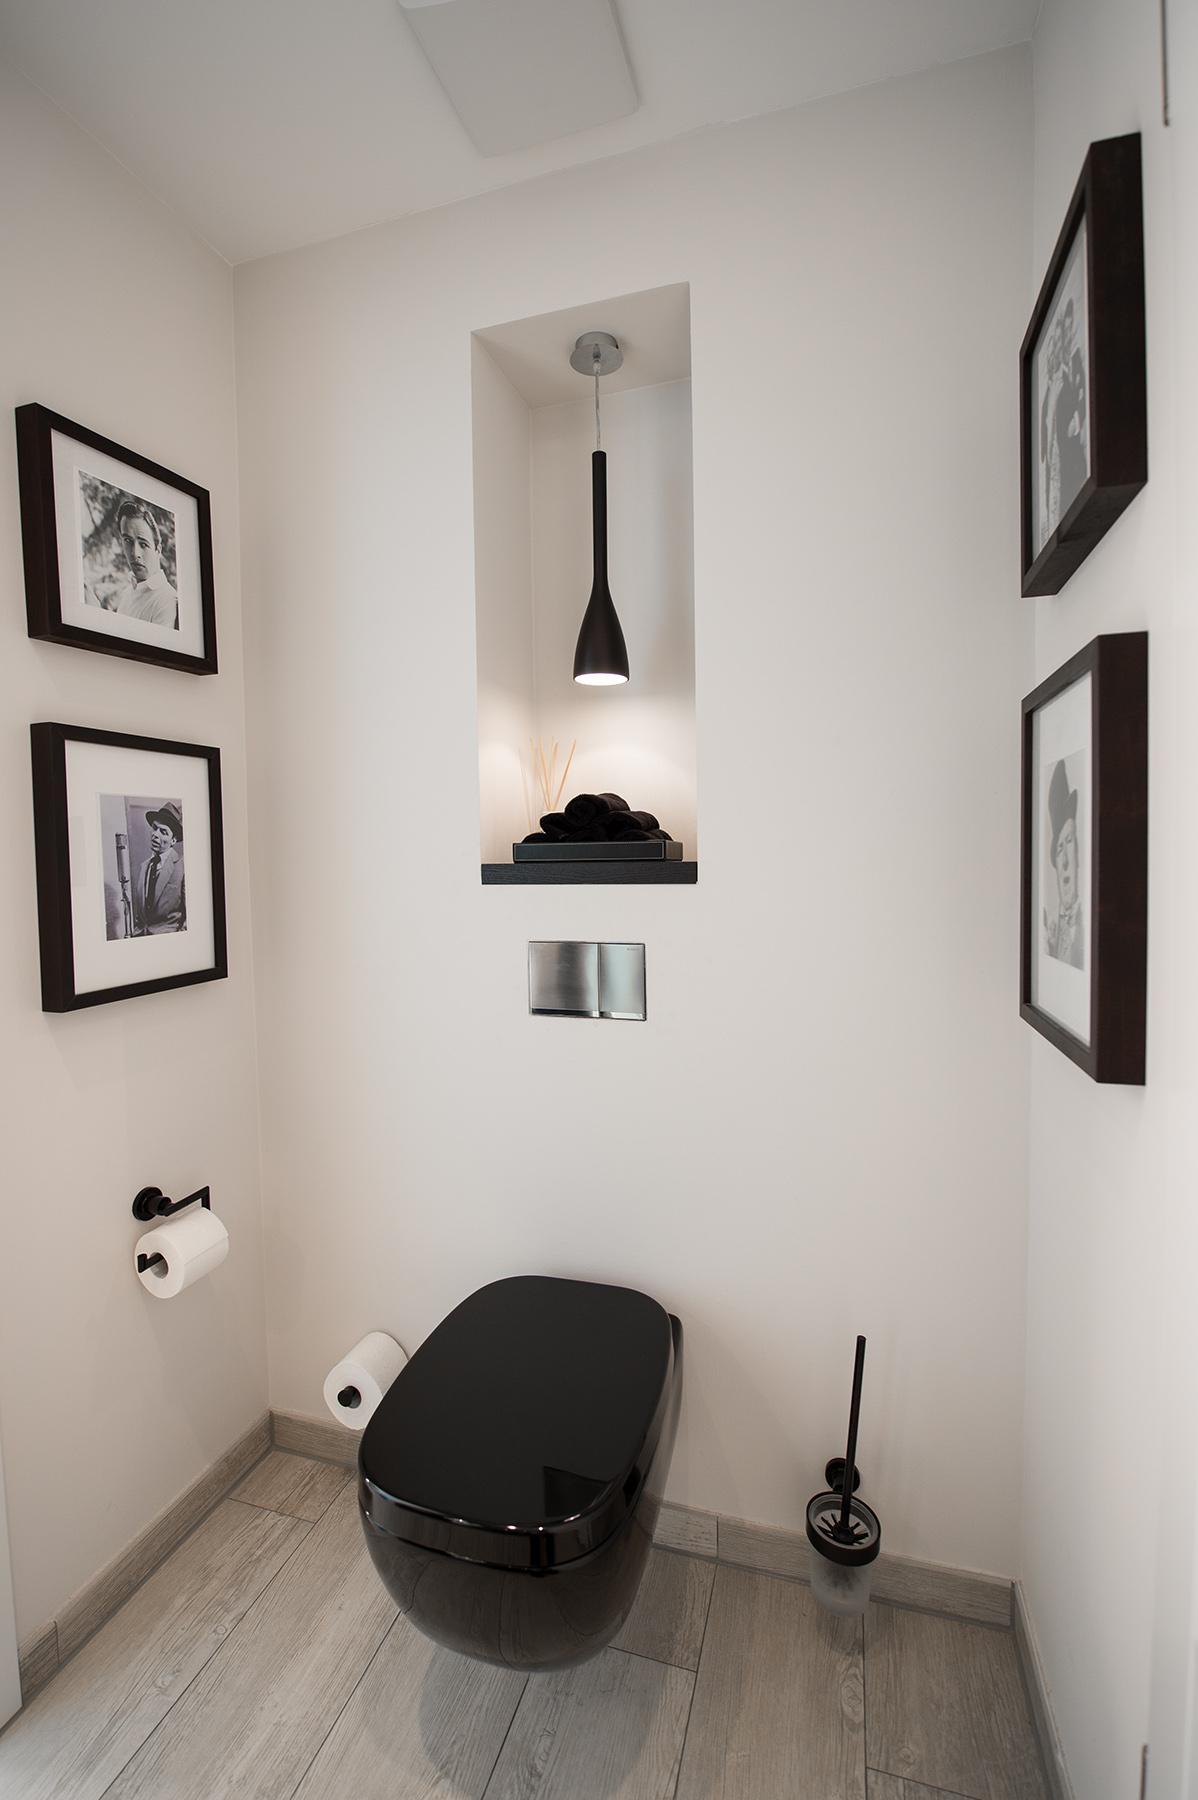 #bestebadstudios #badezimmer #bad #wc #baddeko #modernesbadezimmer  #badsanierung